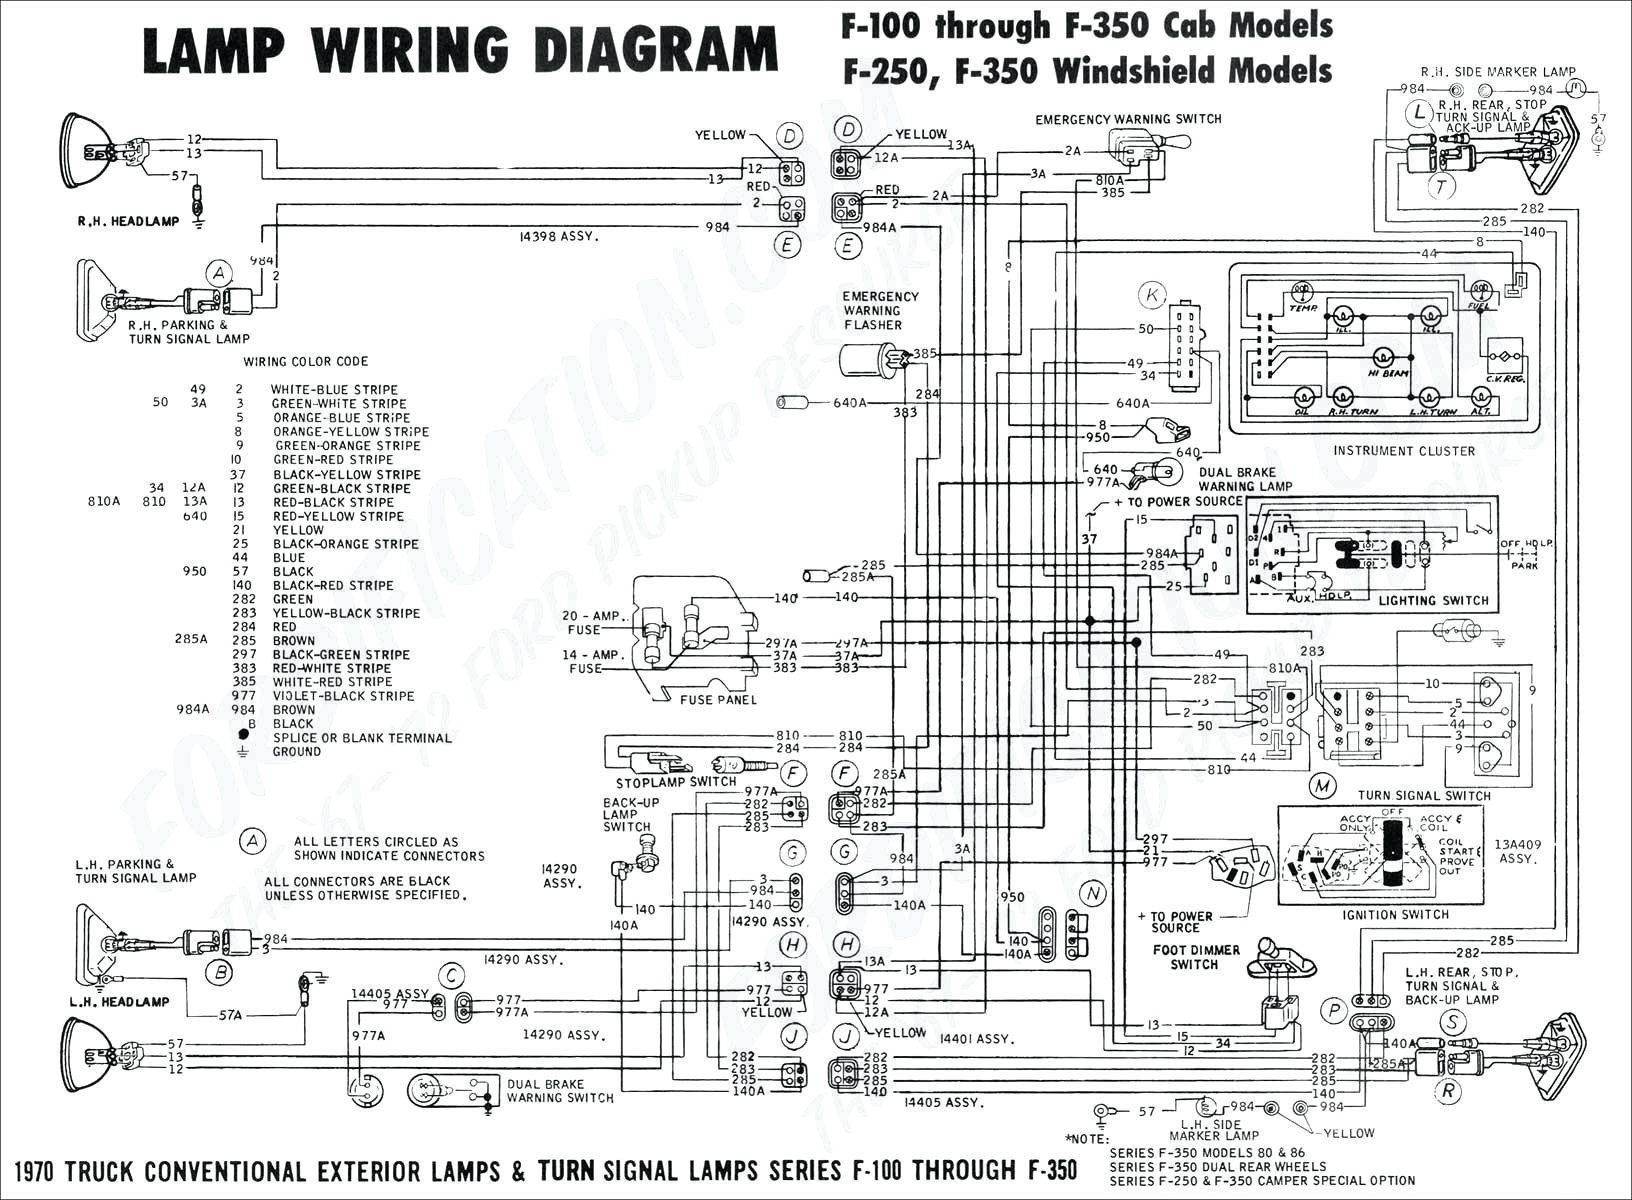 Suzuki Samurai Alternator Wiring Diagram Bo 2633] 1986 Chevy Truck Wiring Diagram Furthermore Dodge Of Suzuki Samurai Alternator Wiring Diagram